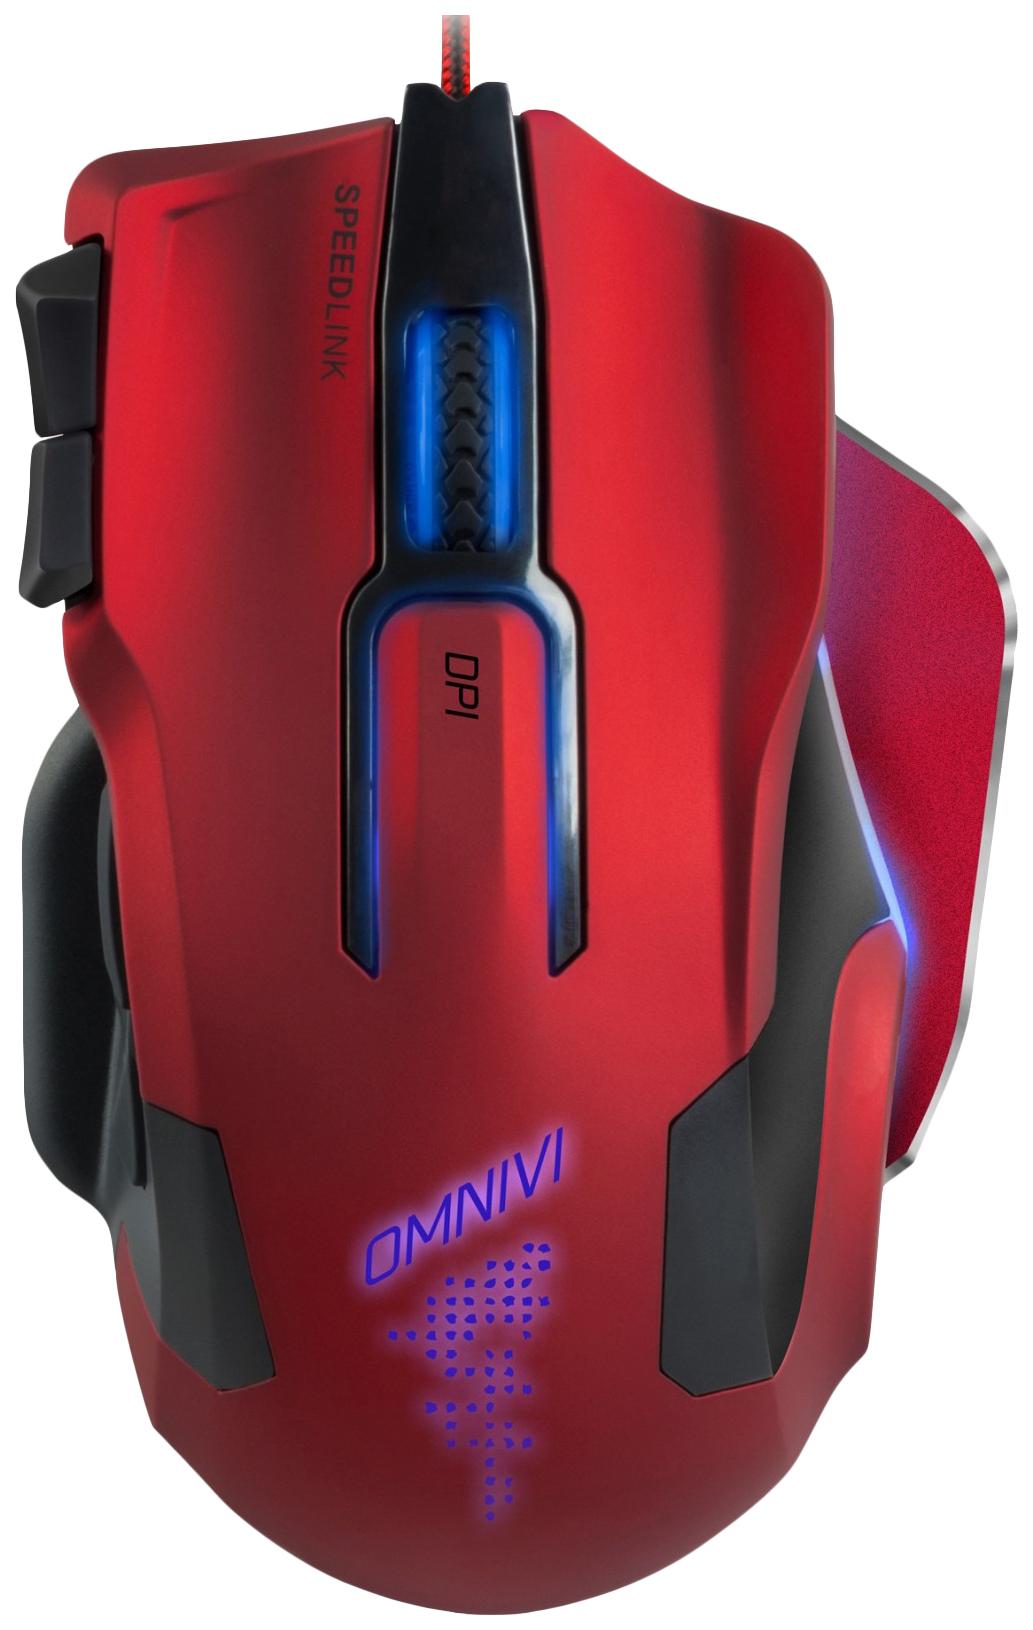 Проводная мышка SPEED-LINK Omnivi Core Red/Black (SL-680006-BKRD)